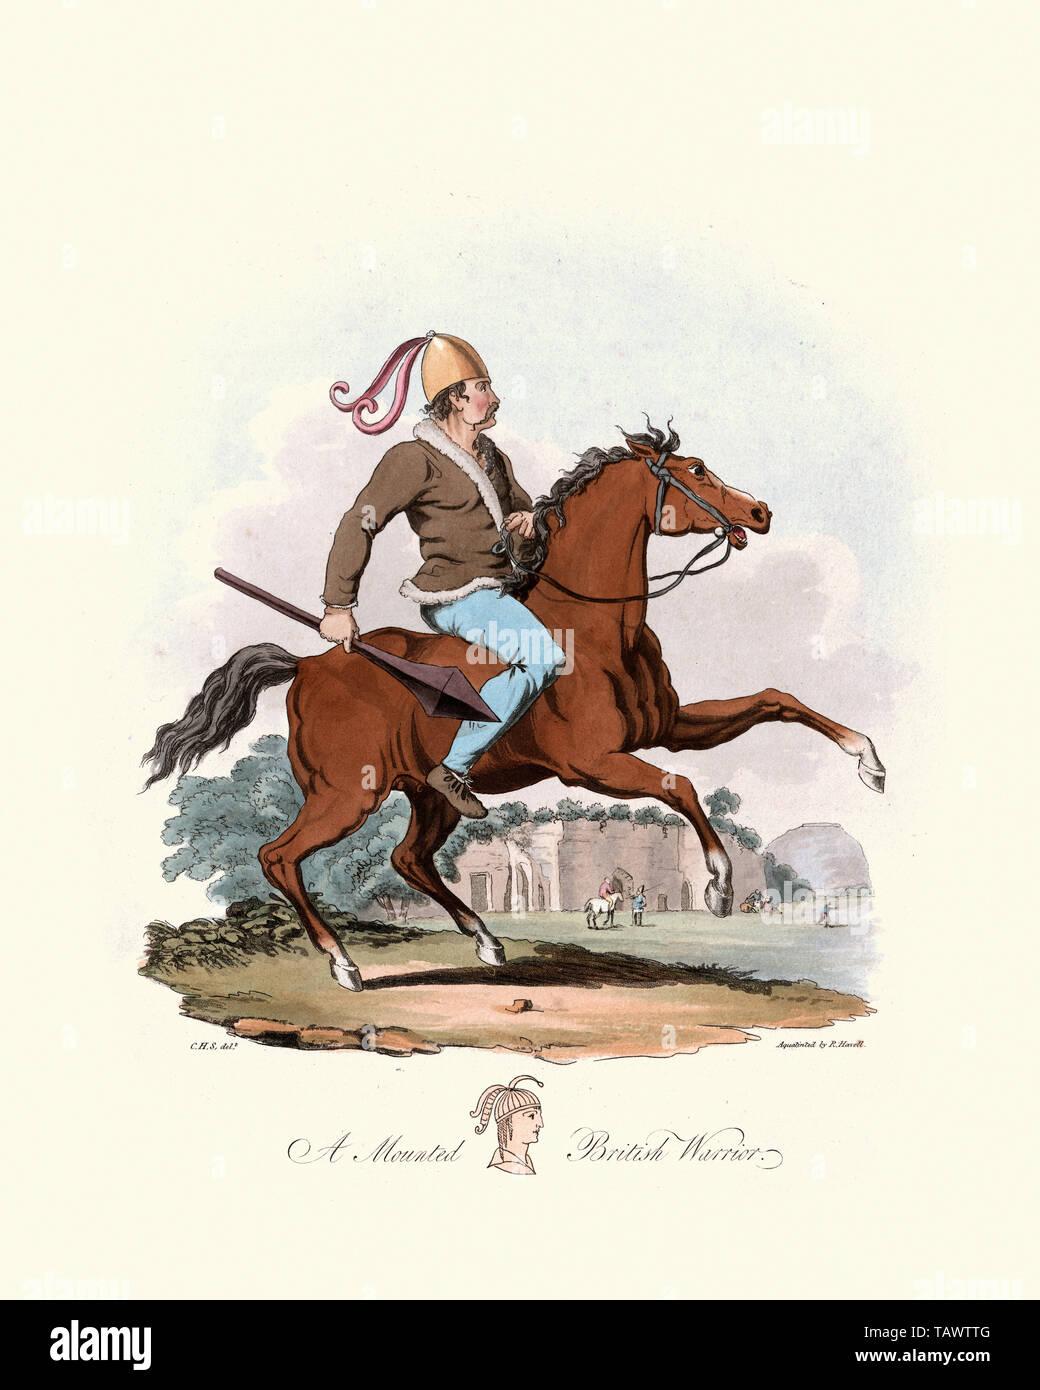 Mounted British Warrior. 1815, The Costume of the Original Inhabitants of the British Islands, by MEYRICK, Samuel Rush and SMITH Charles Hamilton Stock Photo